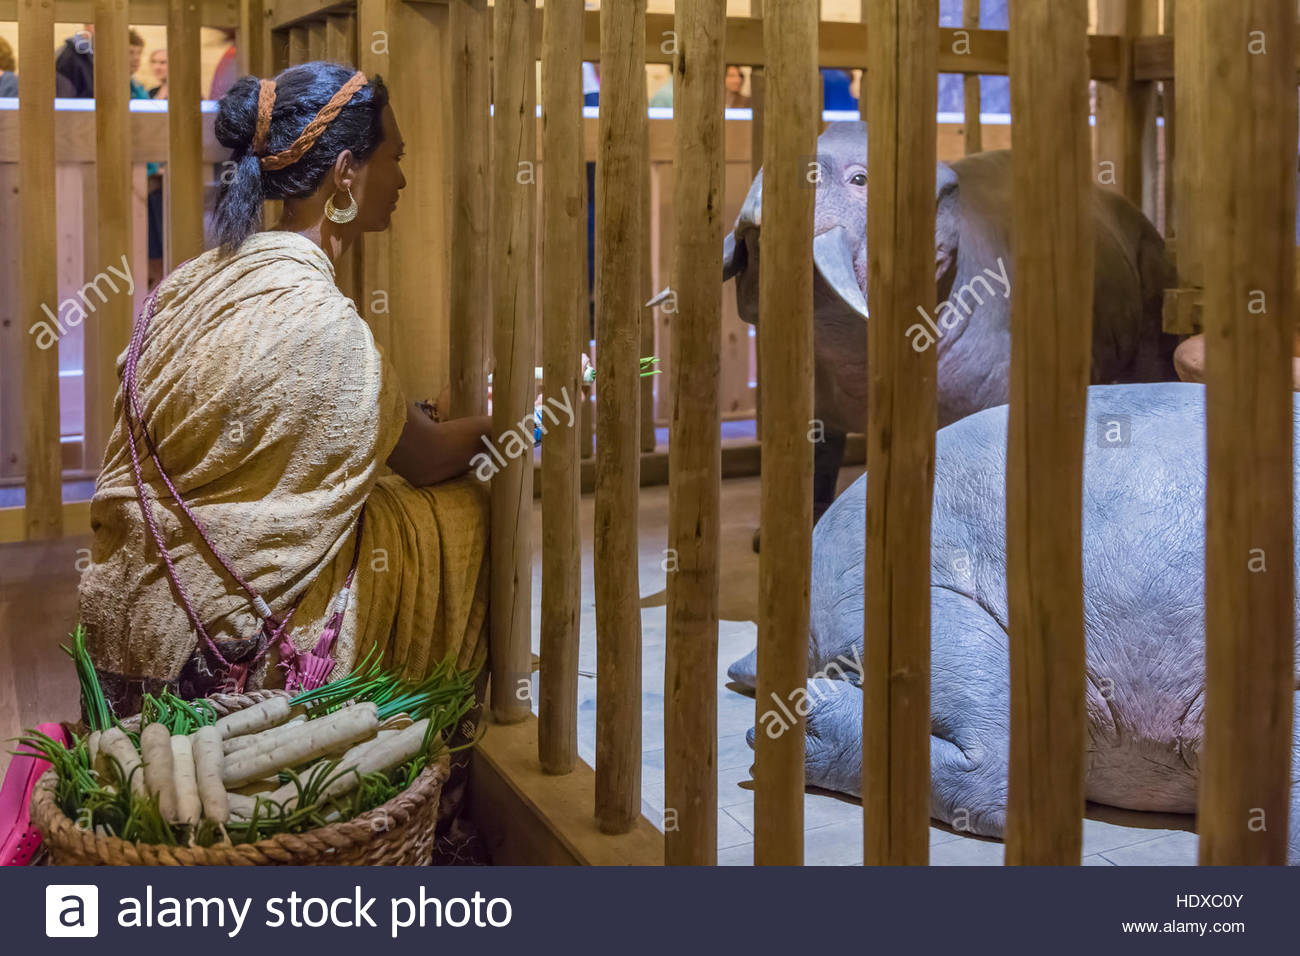 Feeding animals inside noah 39 s ark at the ark encounter in for Noah s ark kentucky location